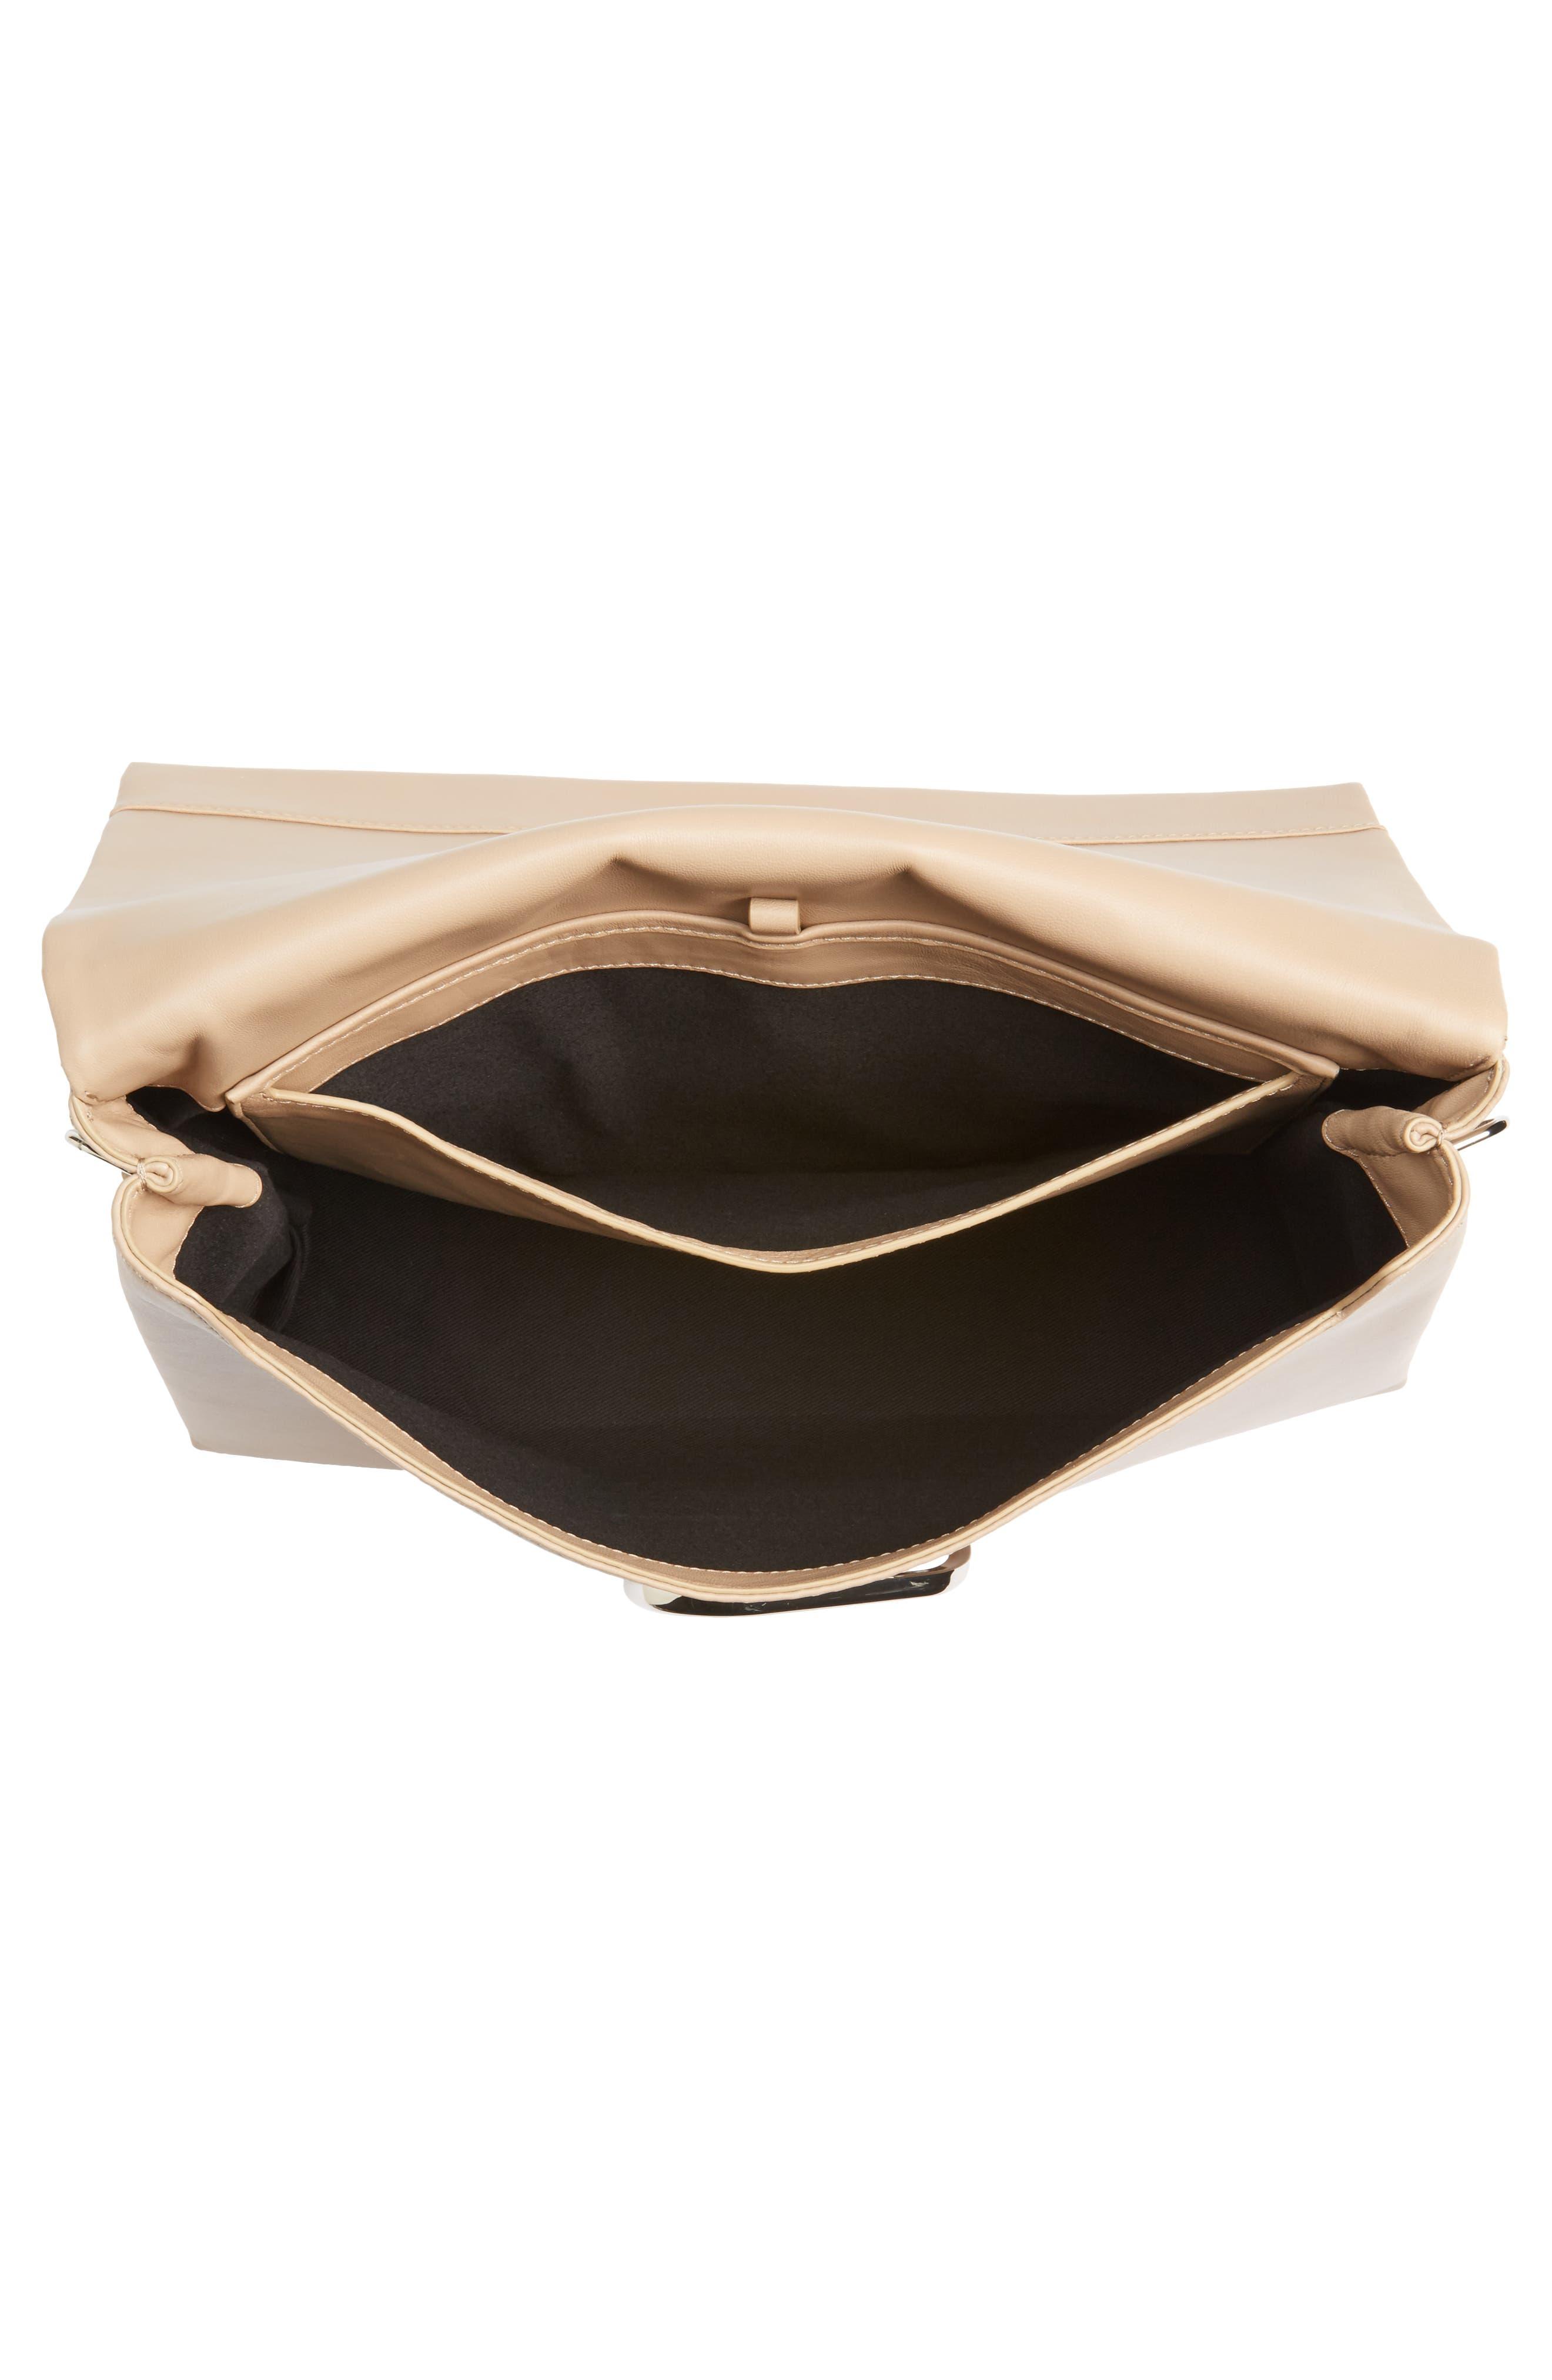 Oversized Alix Flap Leather Shoulder Bag,                             Alternate thumbnail 4, color,                             Fawn